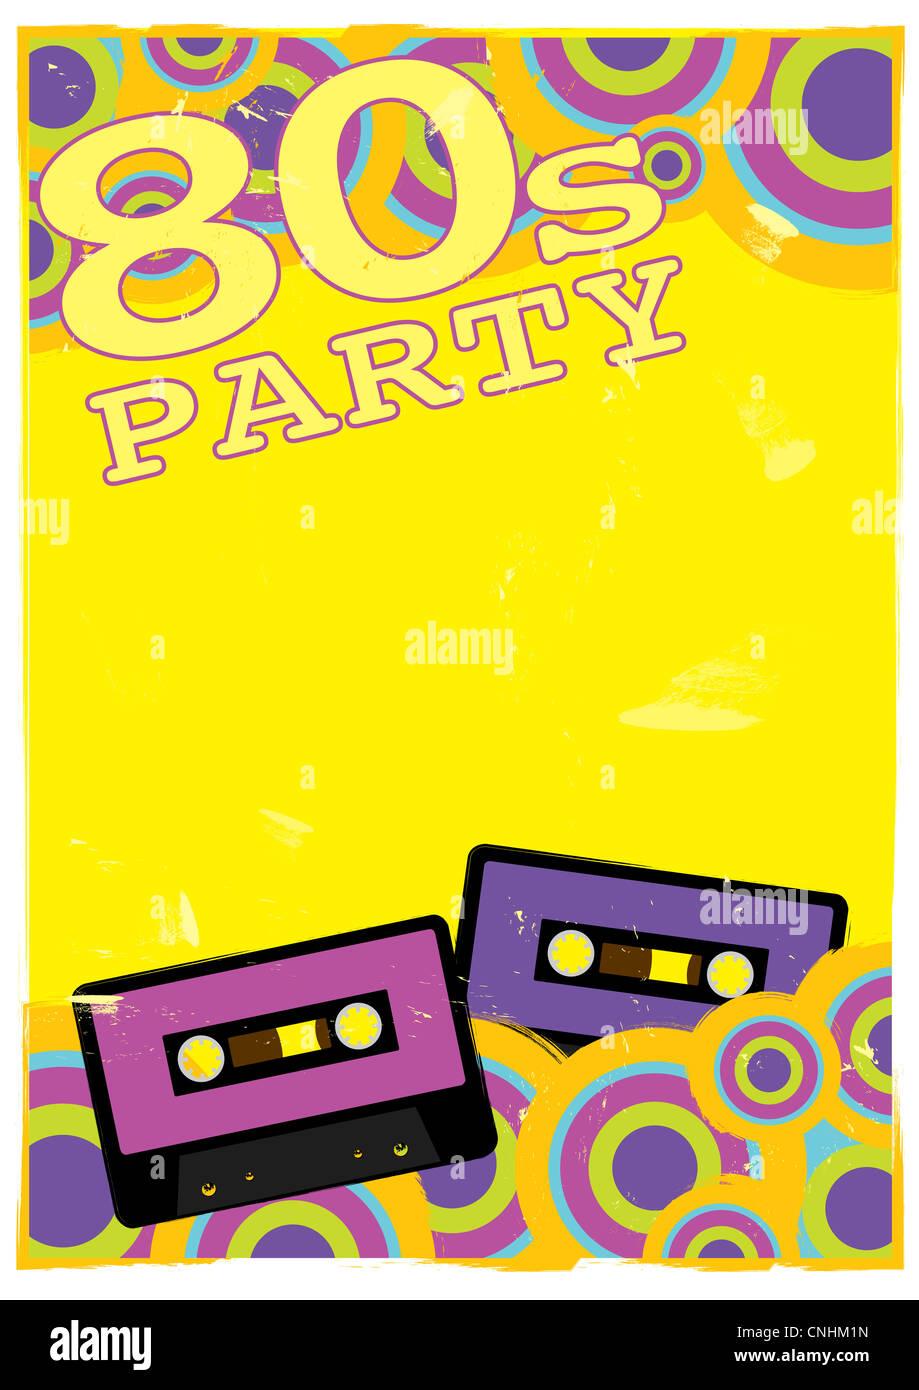 Retro-Poster - 80er Jahre Party Flyer mit Audio-Kassette Stockbild